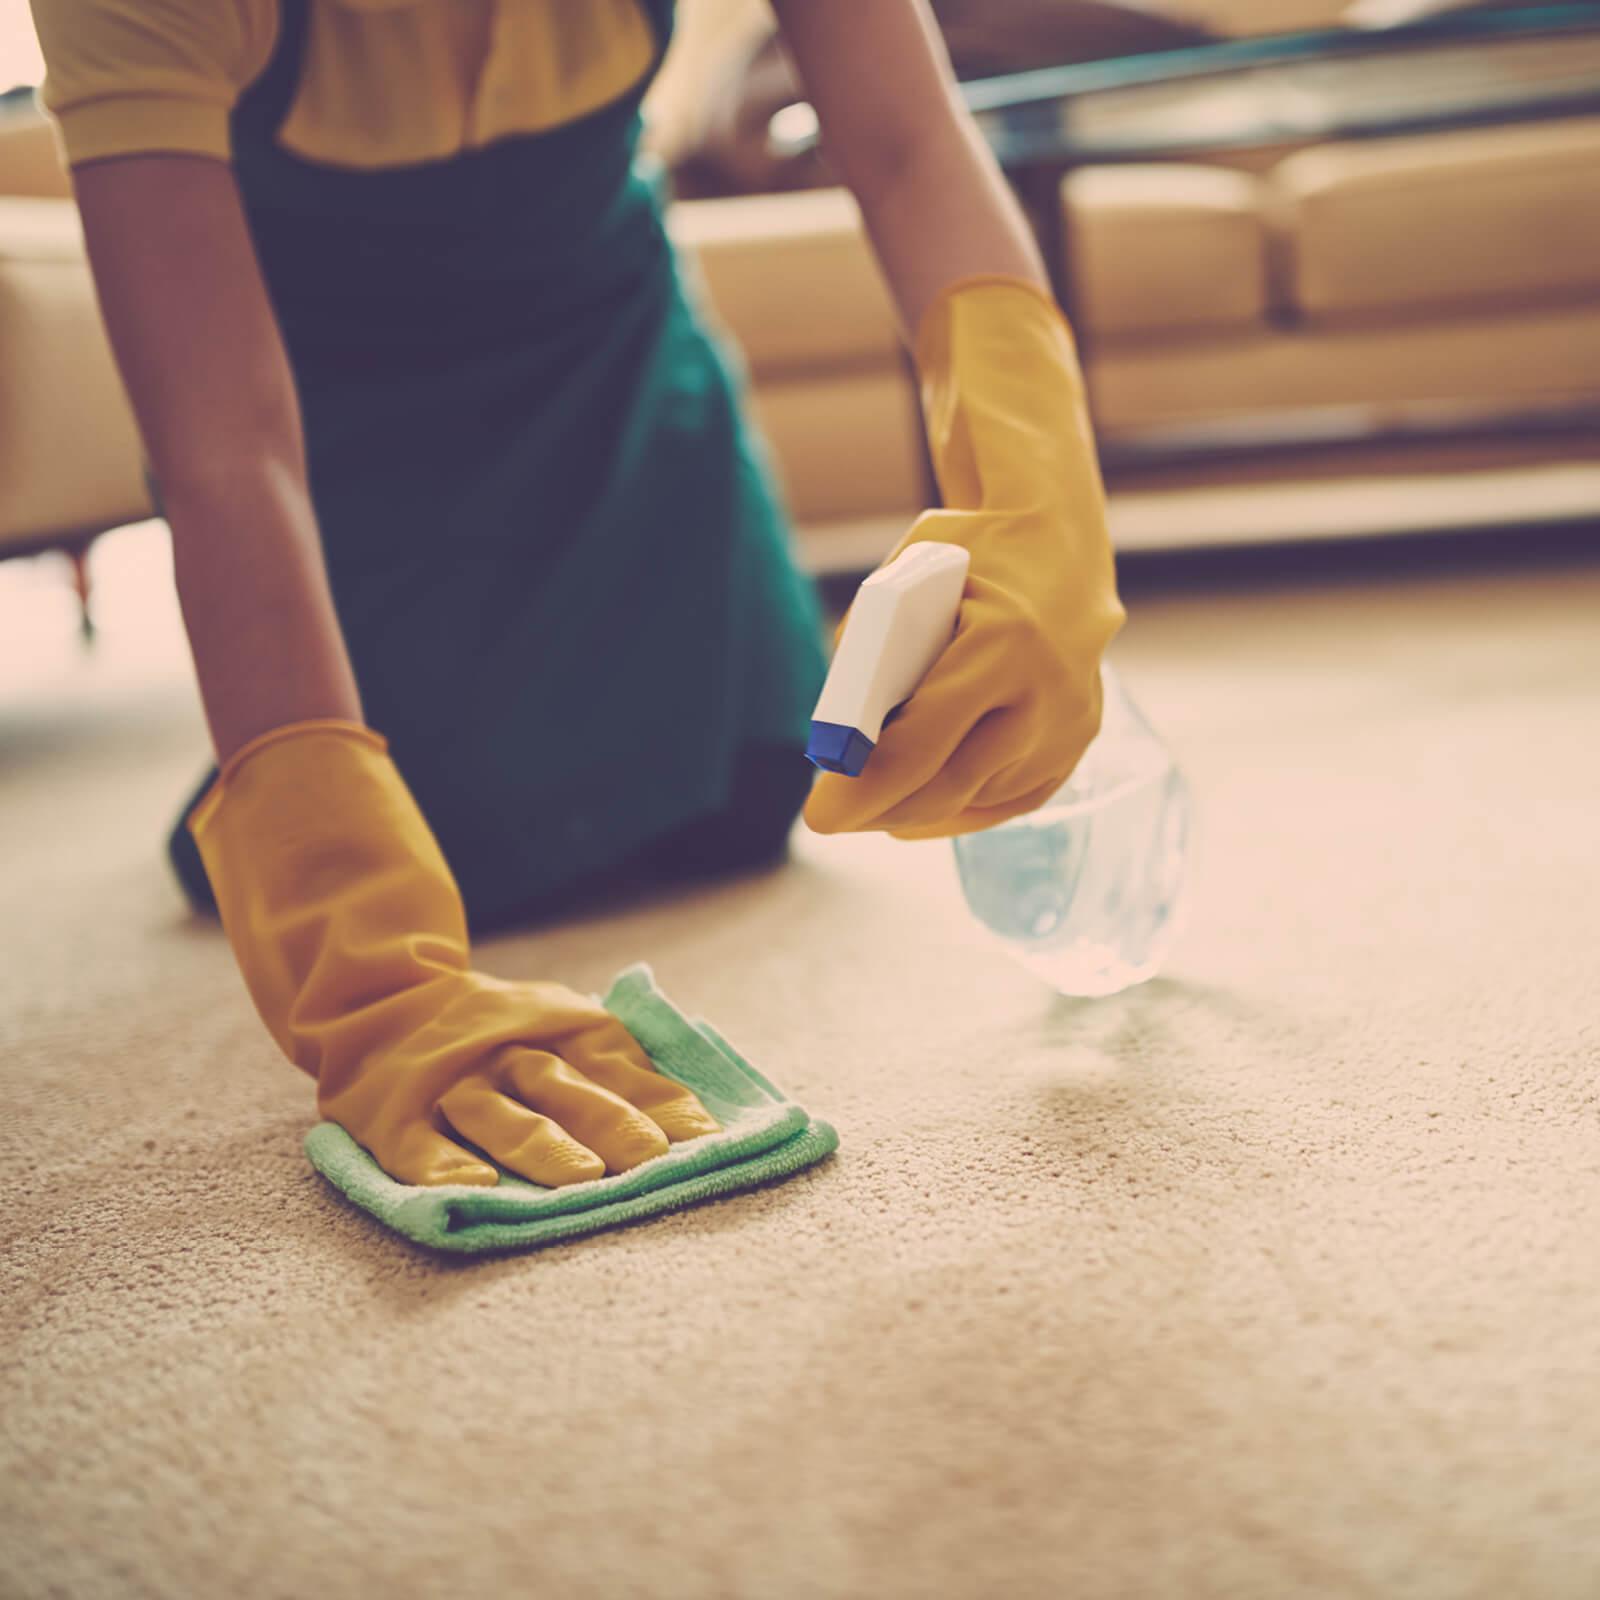 Carpet cleaning   Everlast Floors